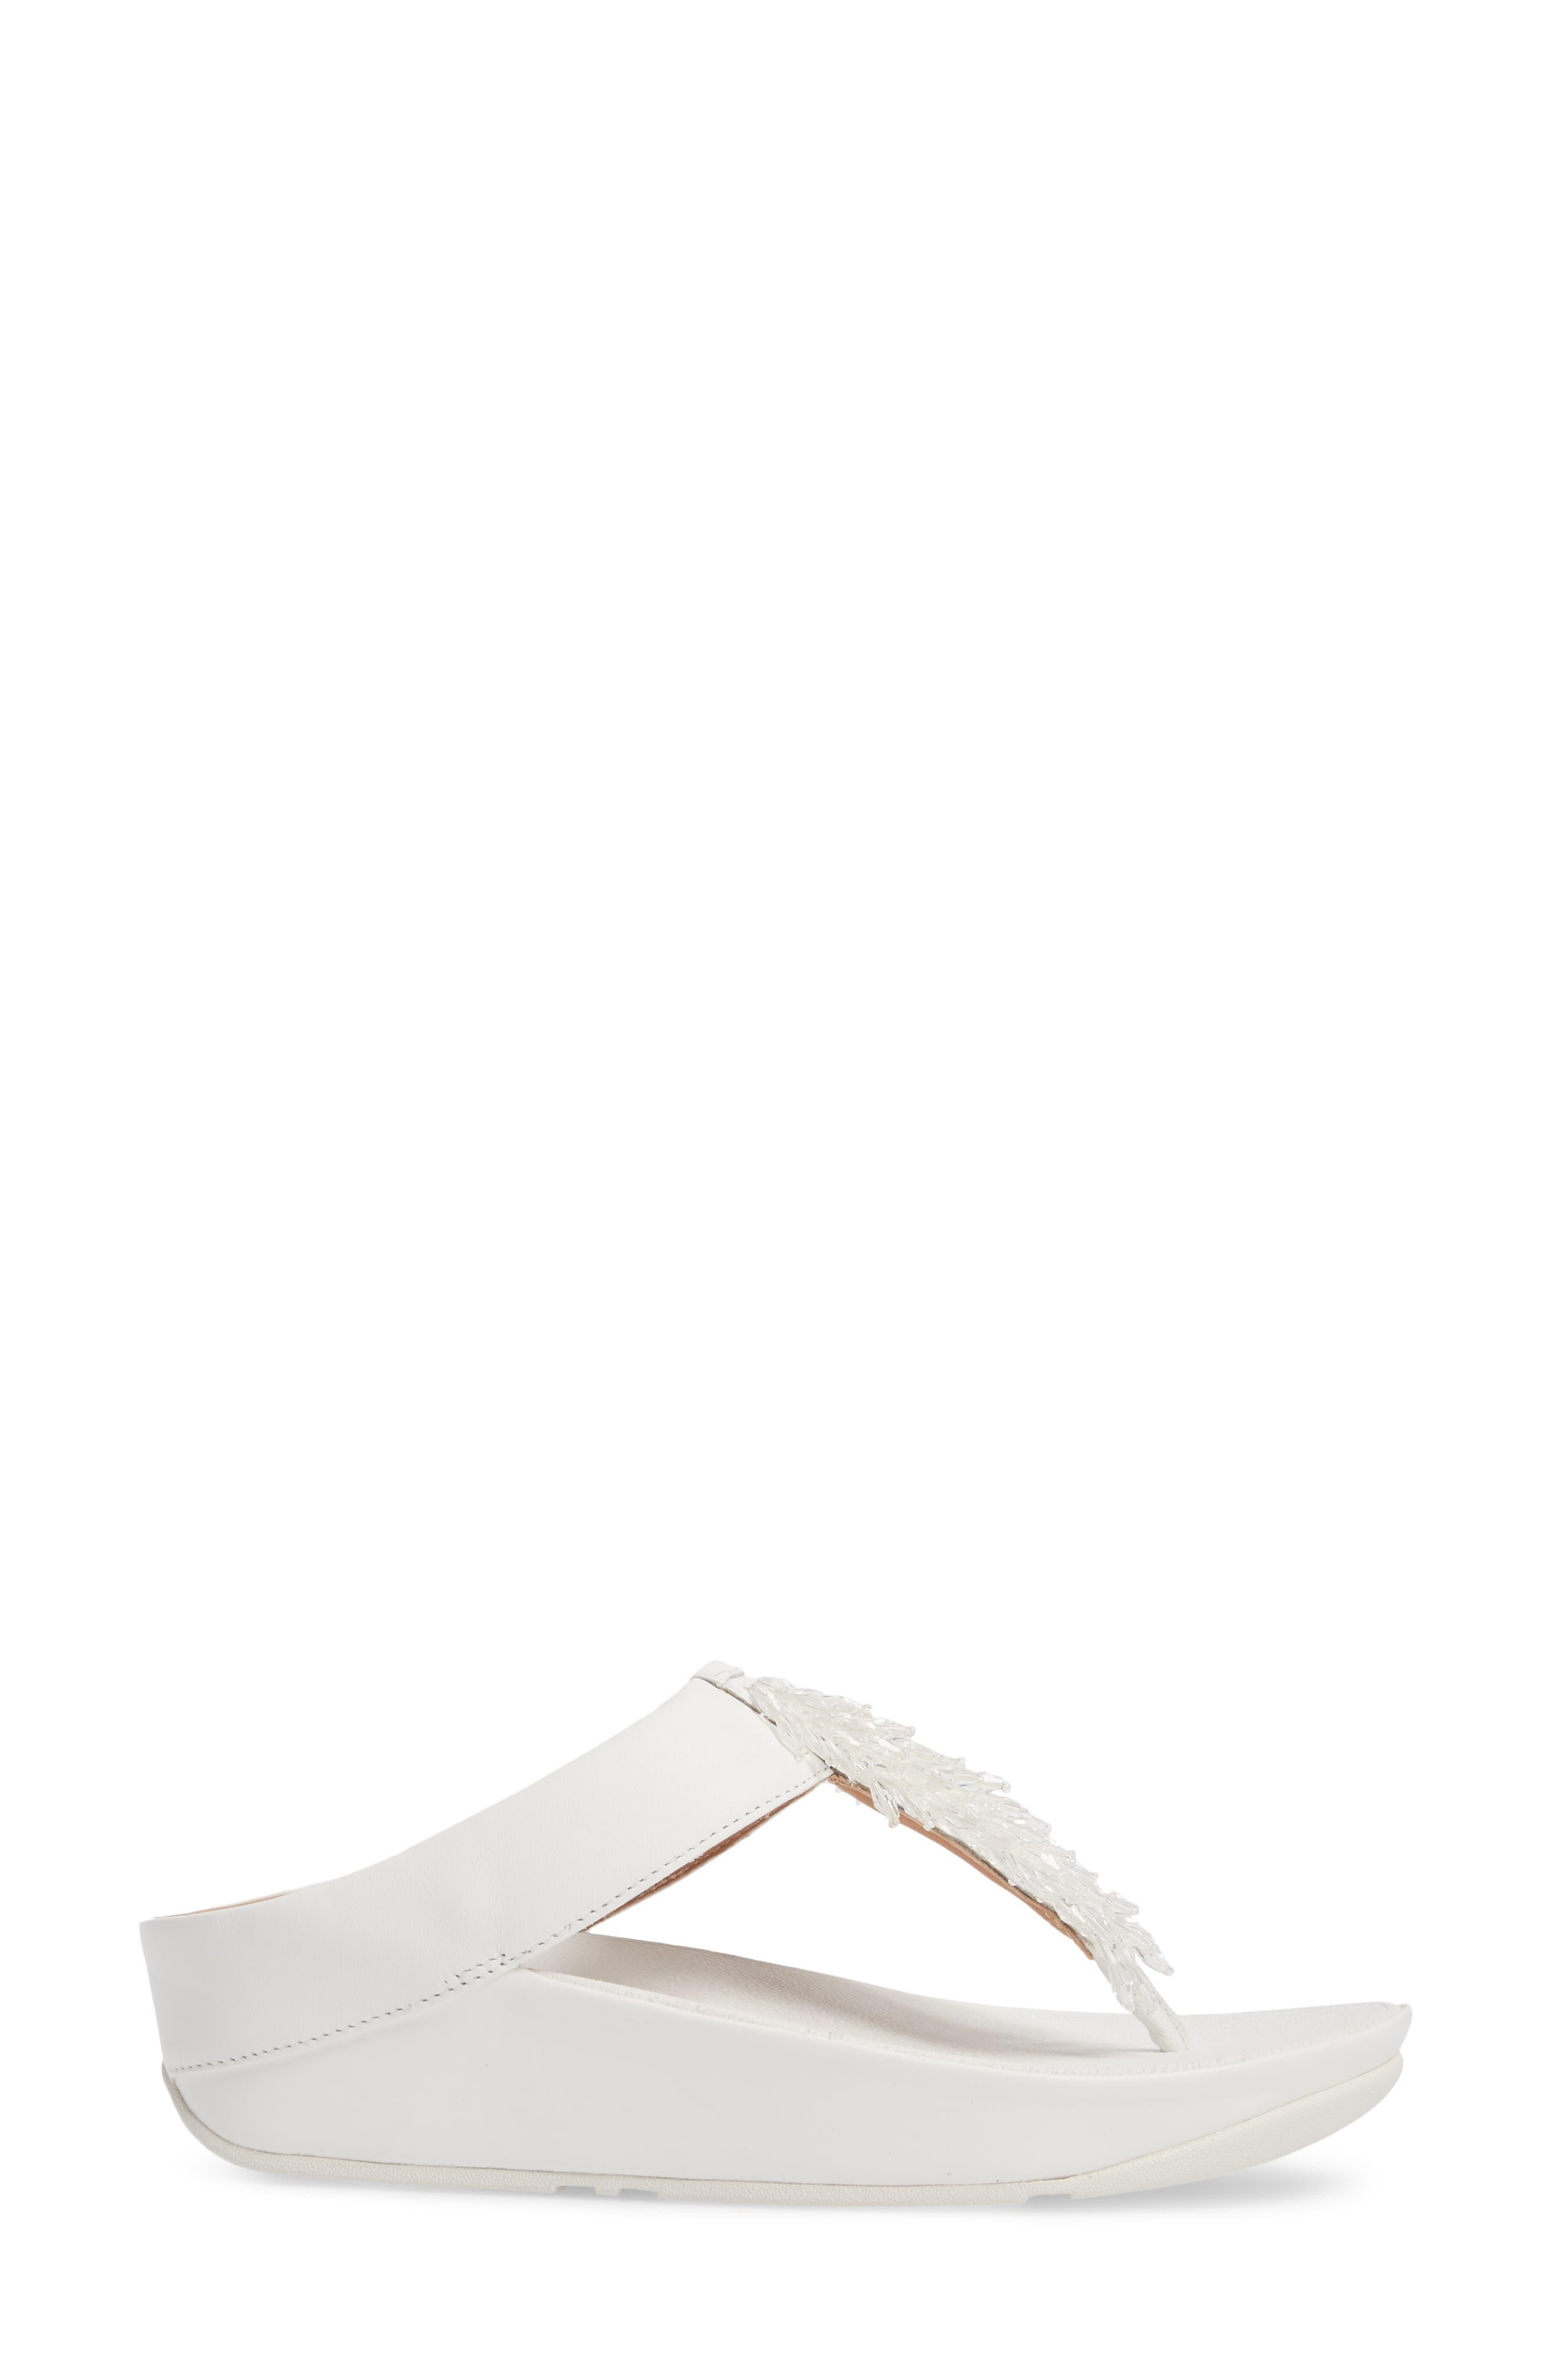 Rumba Sandal,                             Alternate thumbnail 3, color,                             Urban White Leather